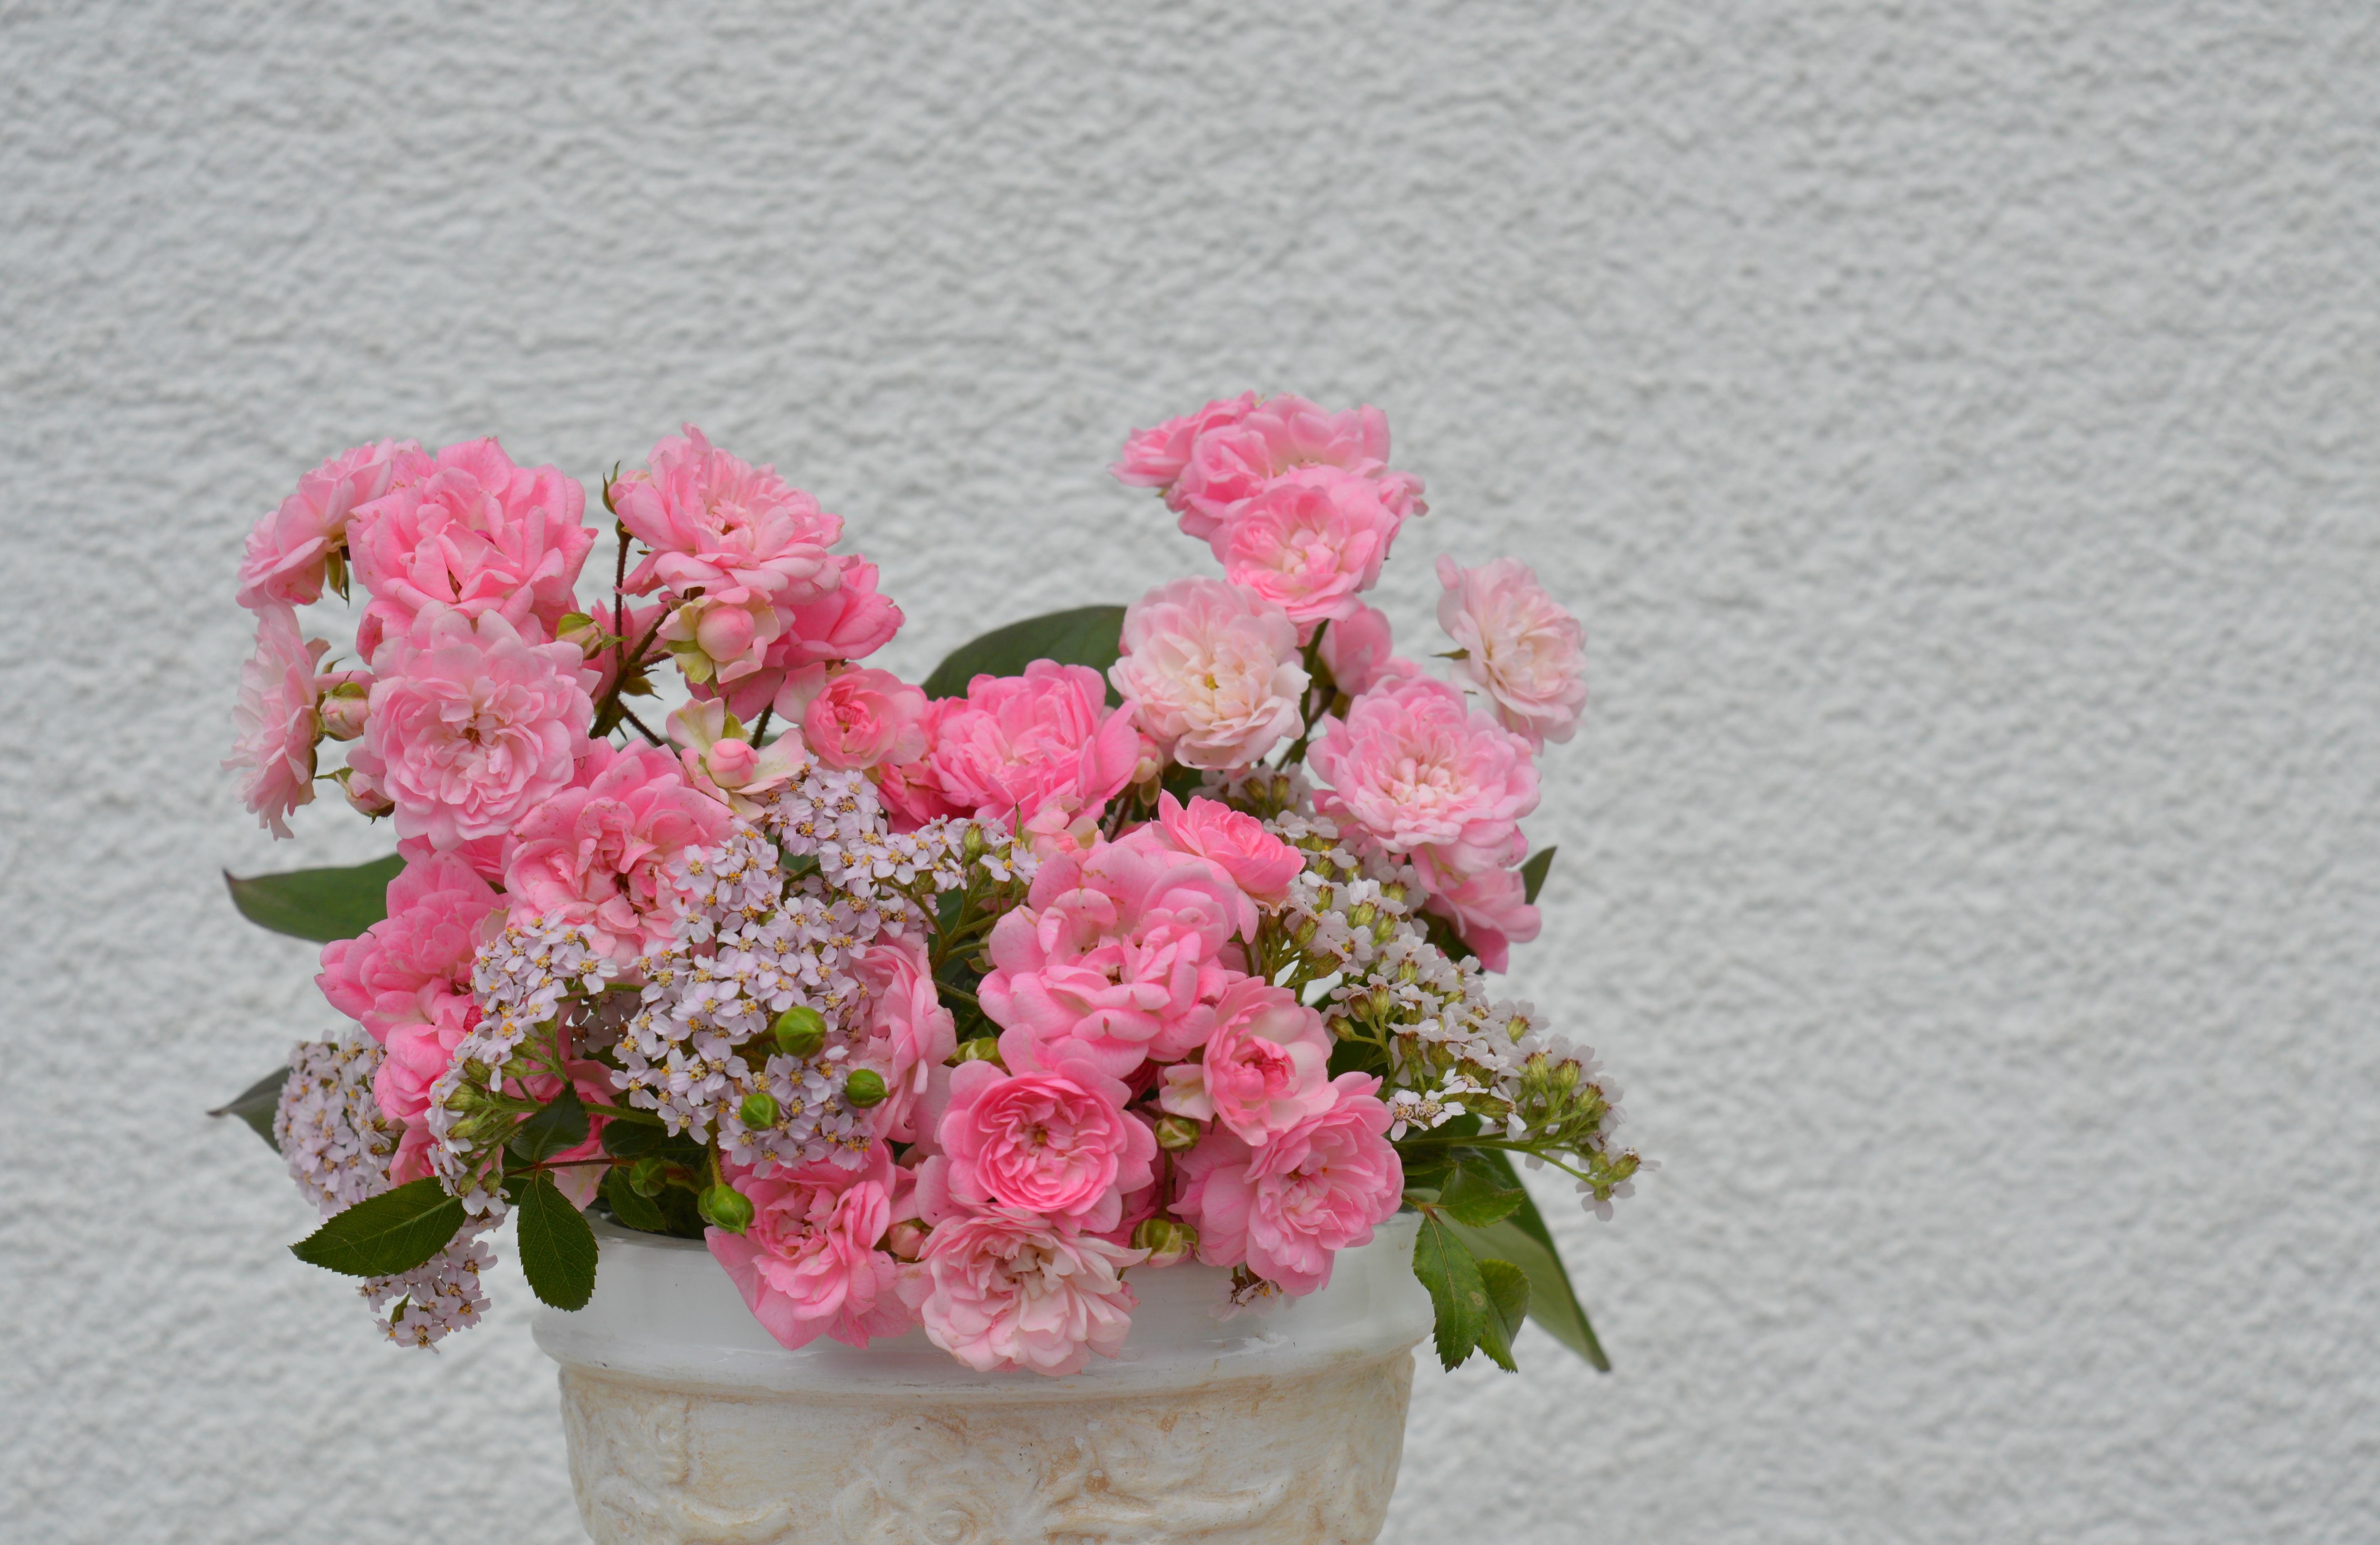 free images blossom petal romance close hydrangea beautiful